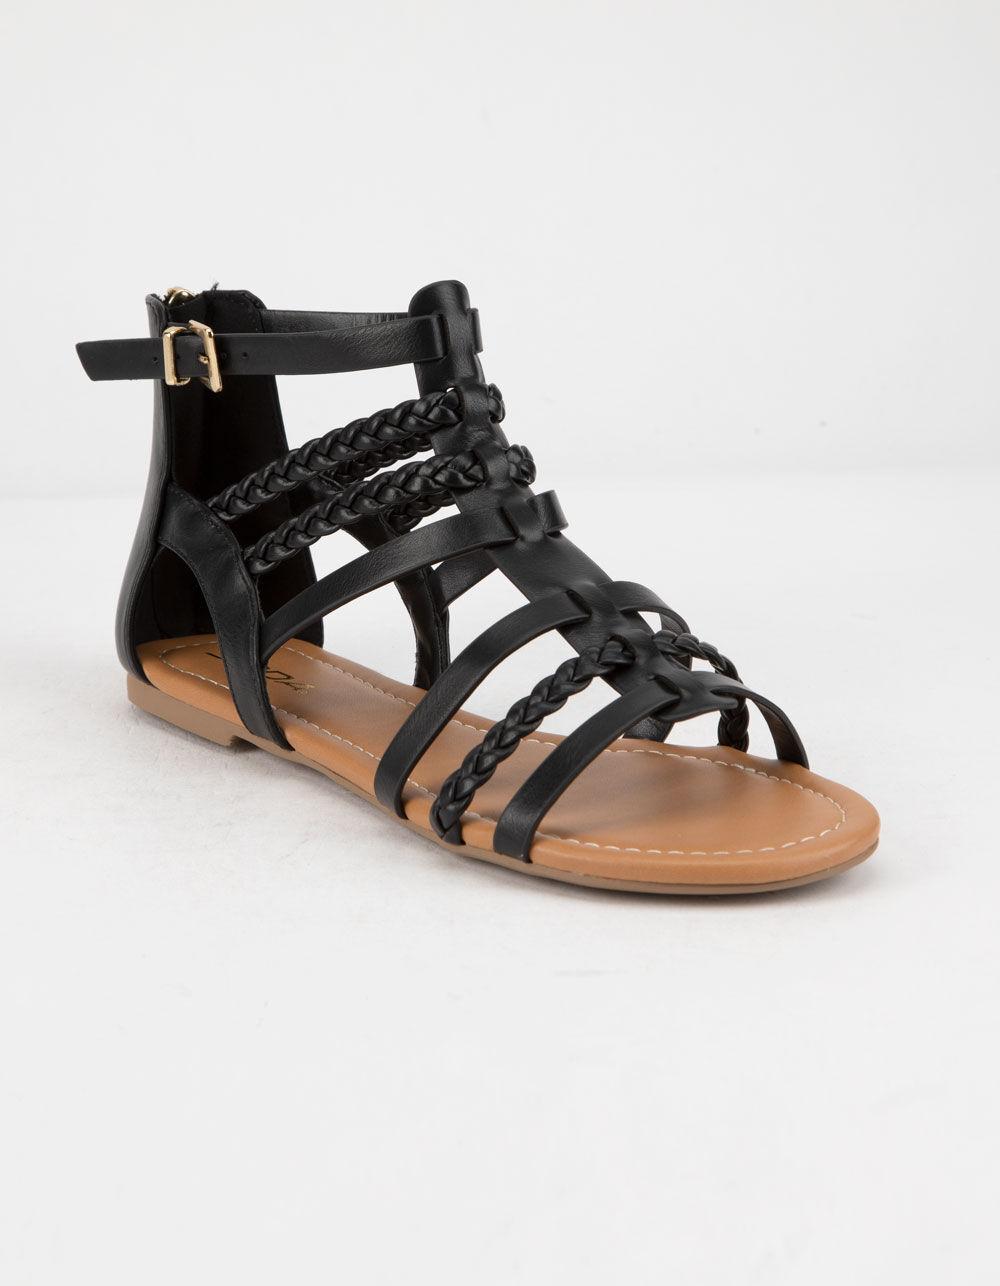 SODA Braid Back Zip Black Gladiator Sandals